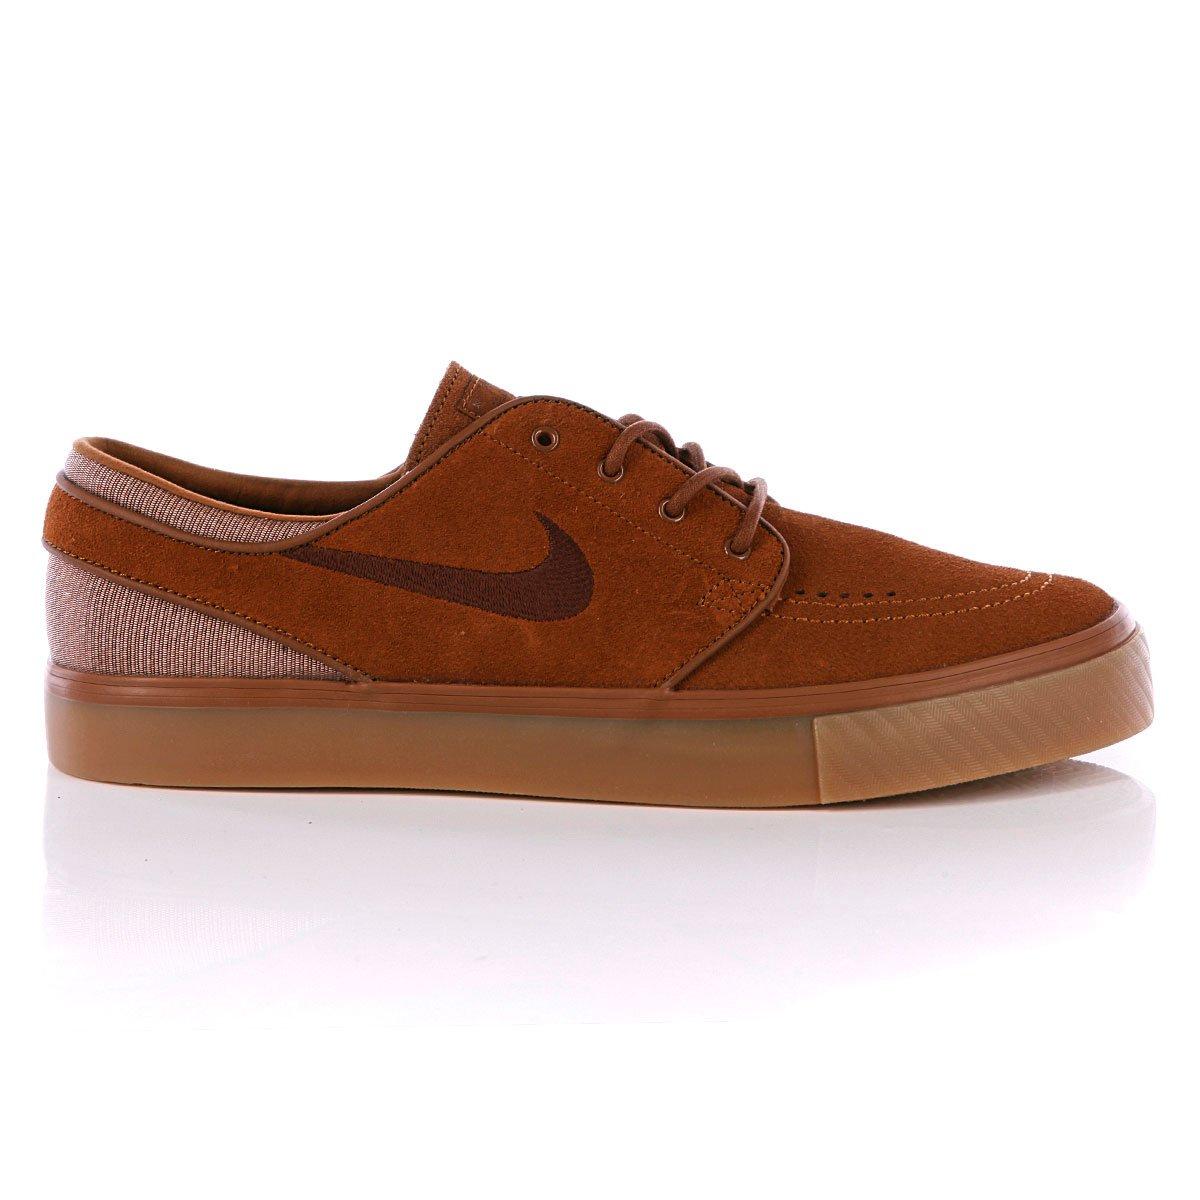 7171a9ee ... Кеды Nike Zoom Stefan Janoski Light British Tan/Dark Field Brown ...